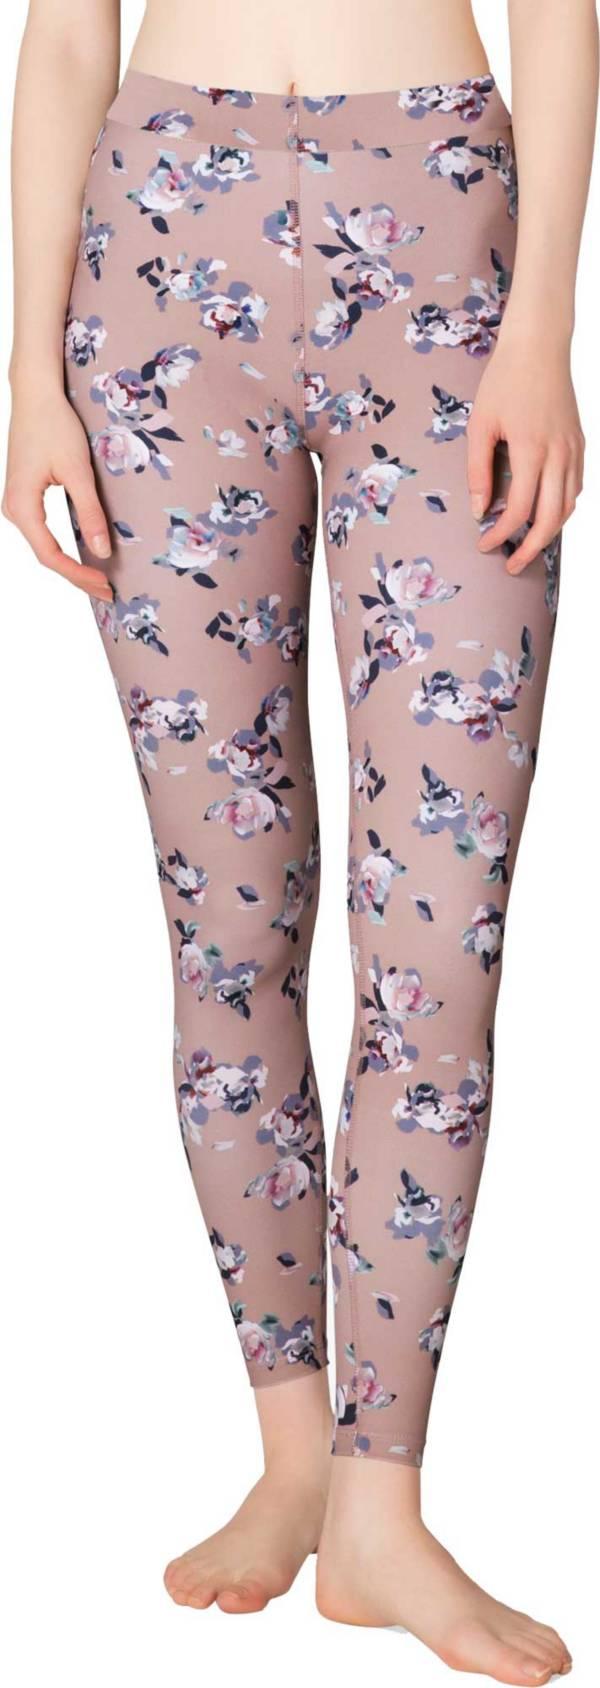 Beyond Yoga Women's High Waist Midi Leggings product image